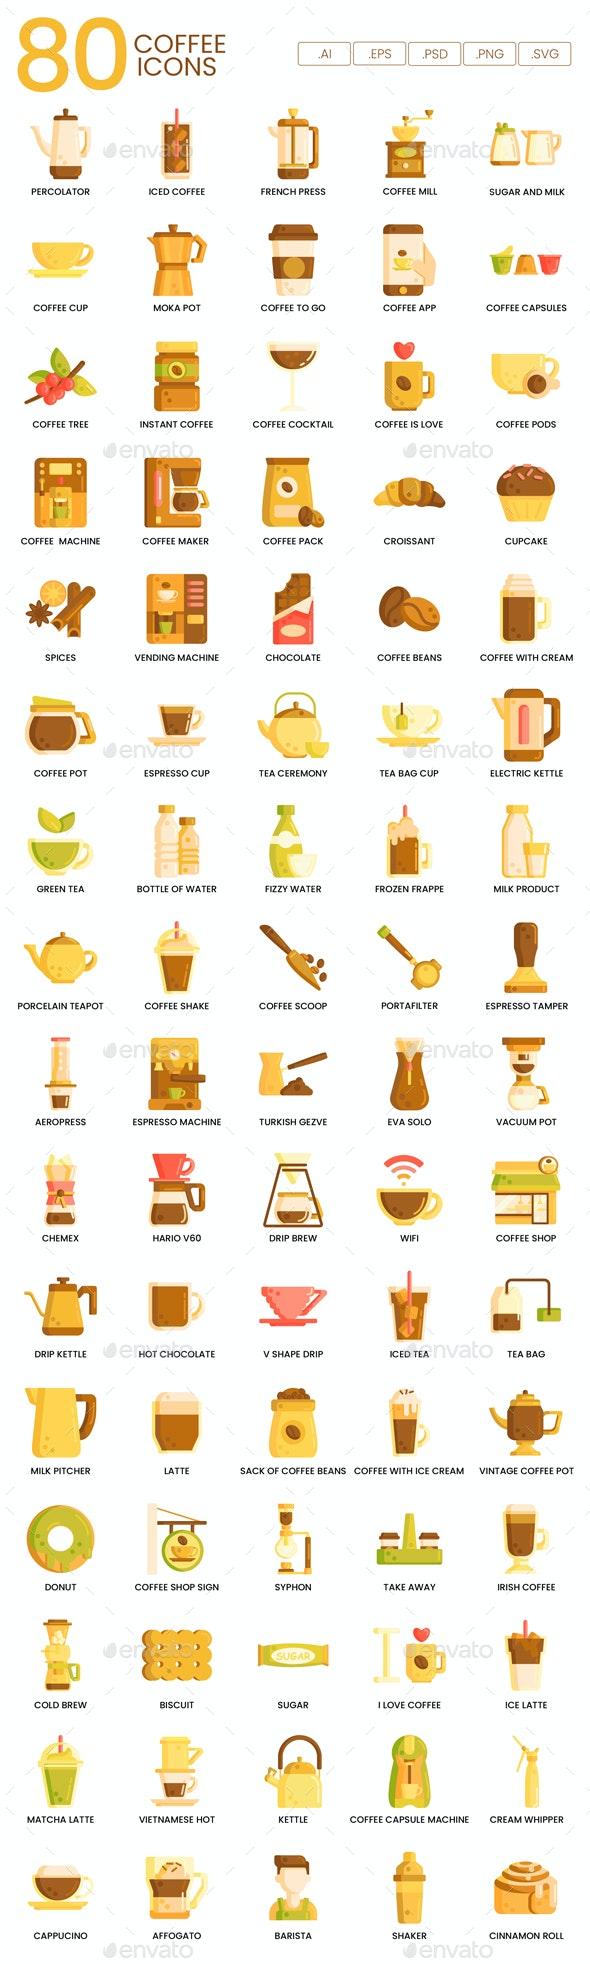 Coffee Icons - Hazel - Food Objects